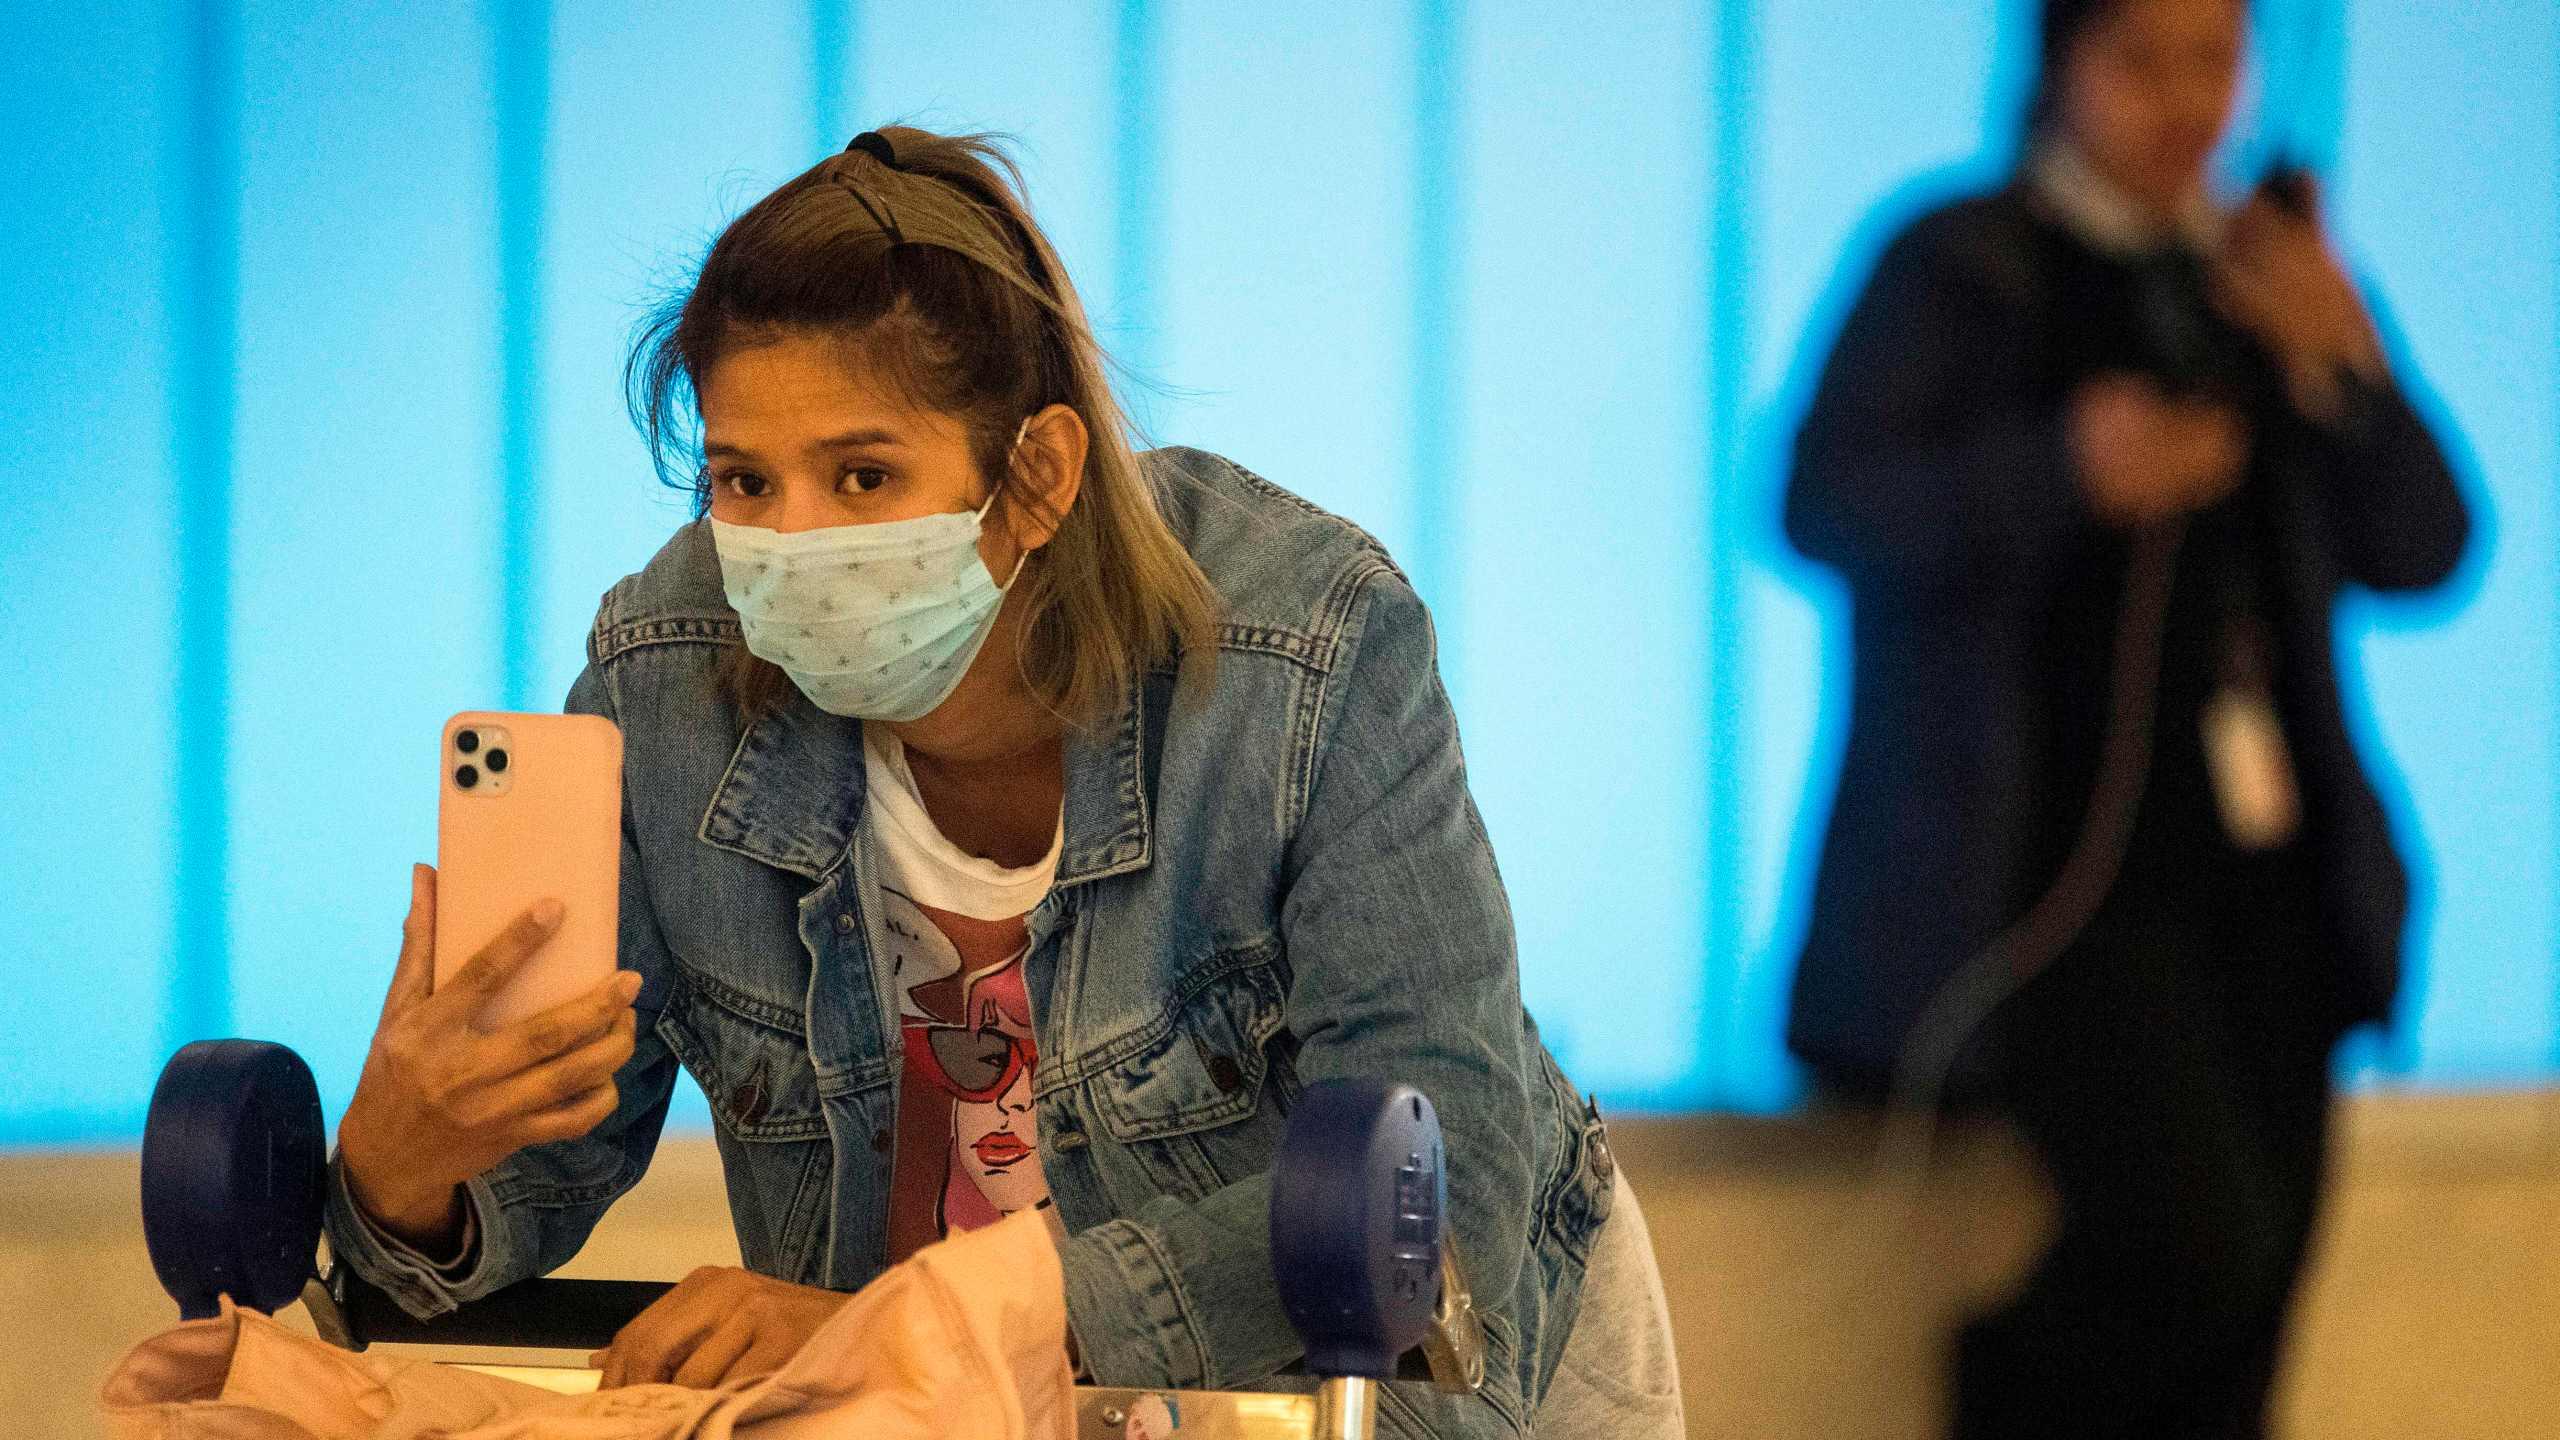 Bbb Warns Of Phony Face Mask For Coronavirus